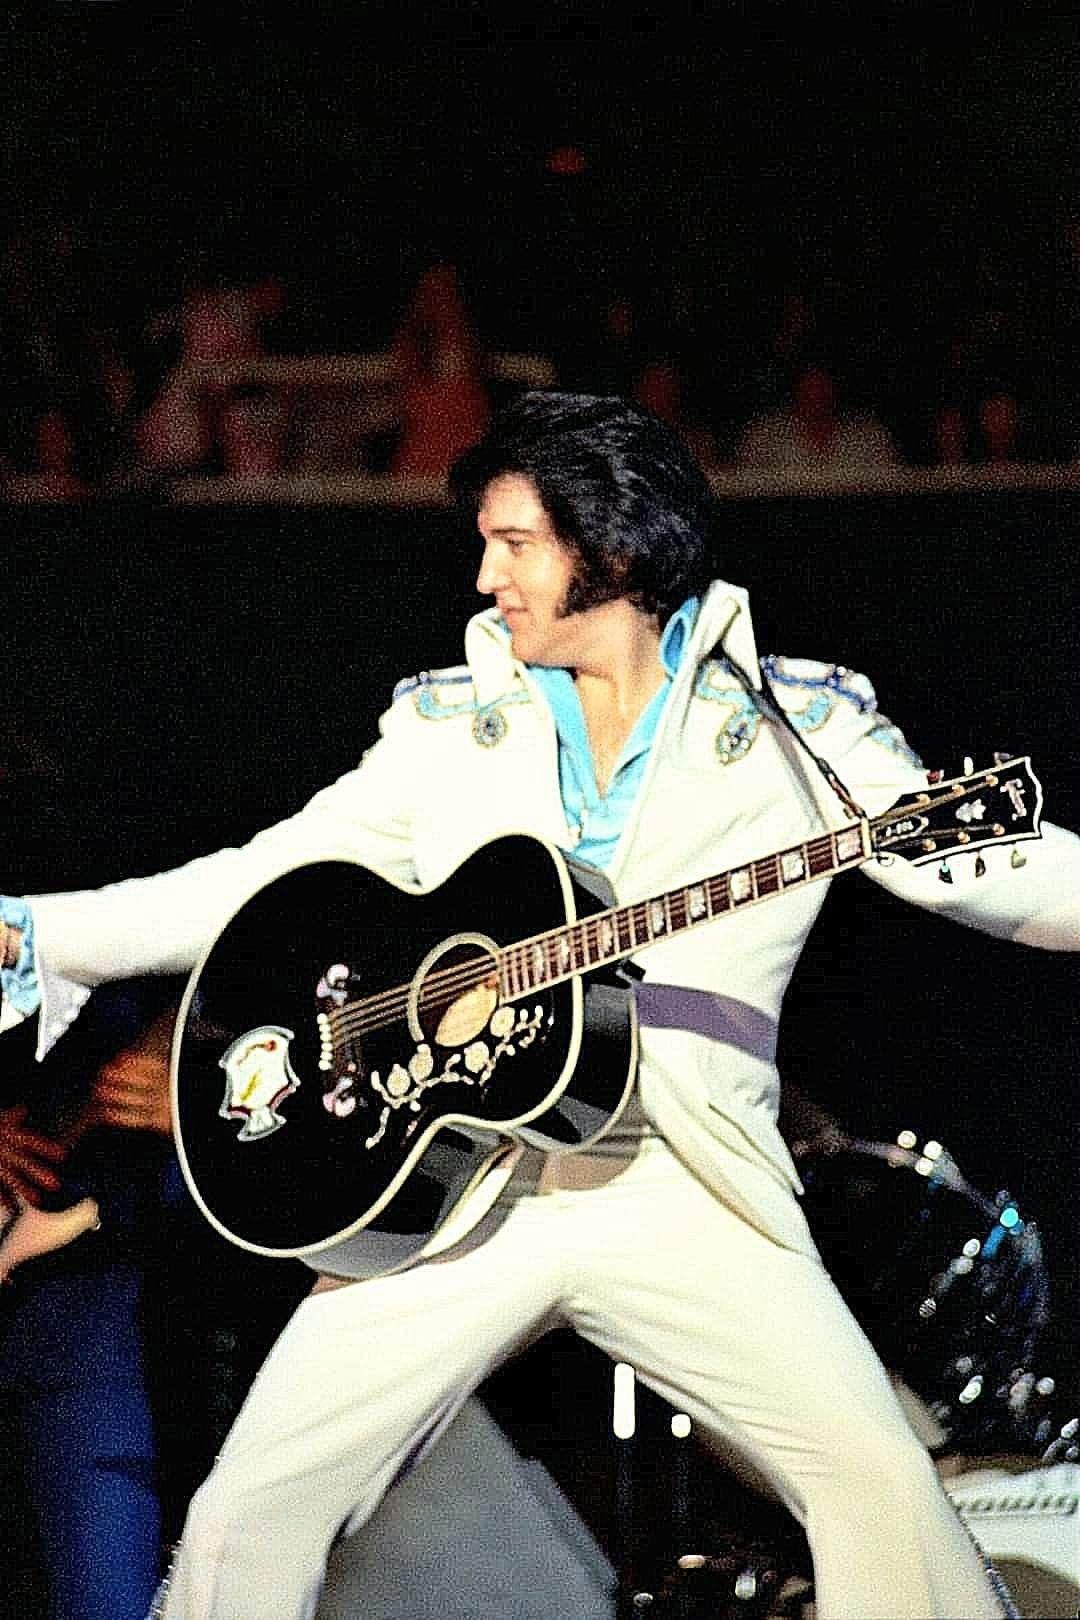 Pin By Anne Bransford On Elvis Presley Concert Photos Elvis